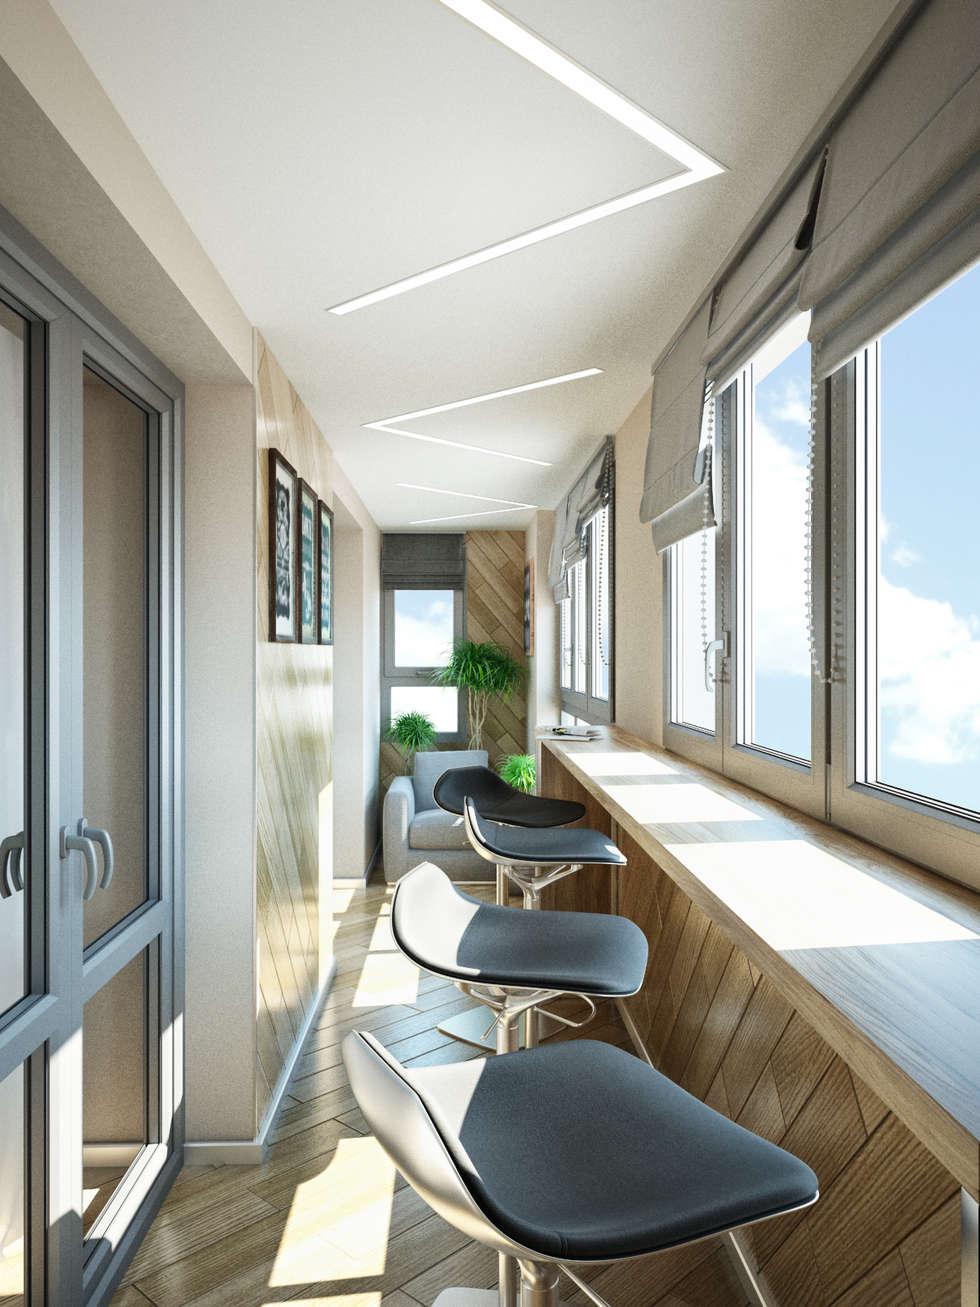 Балкон с барной стойкой by студия архитектуры и дизайна диал.